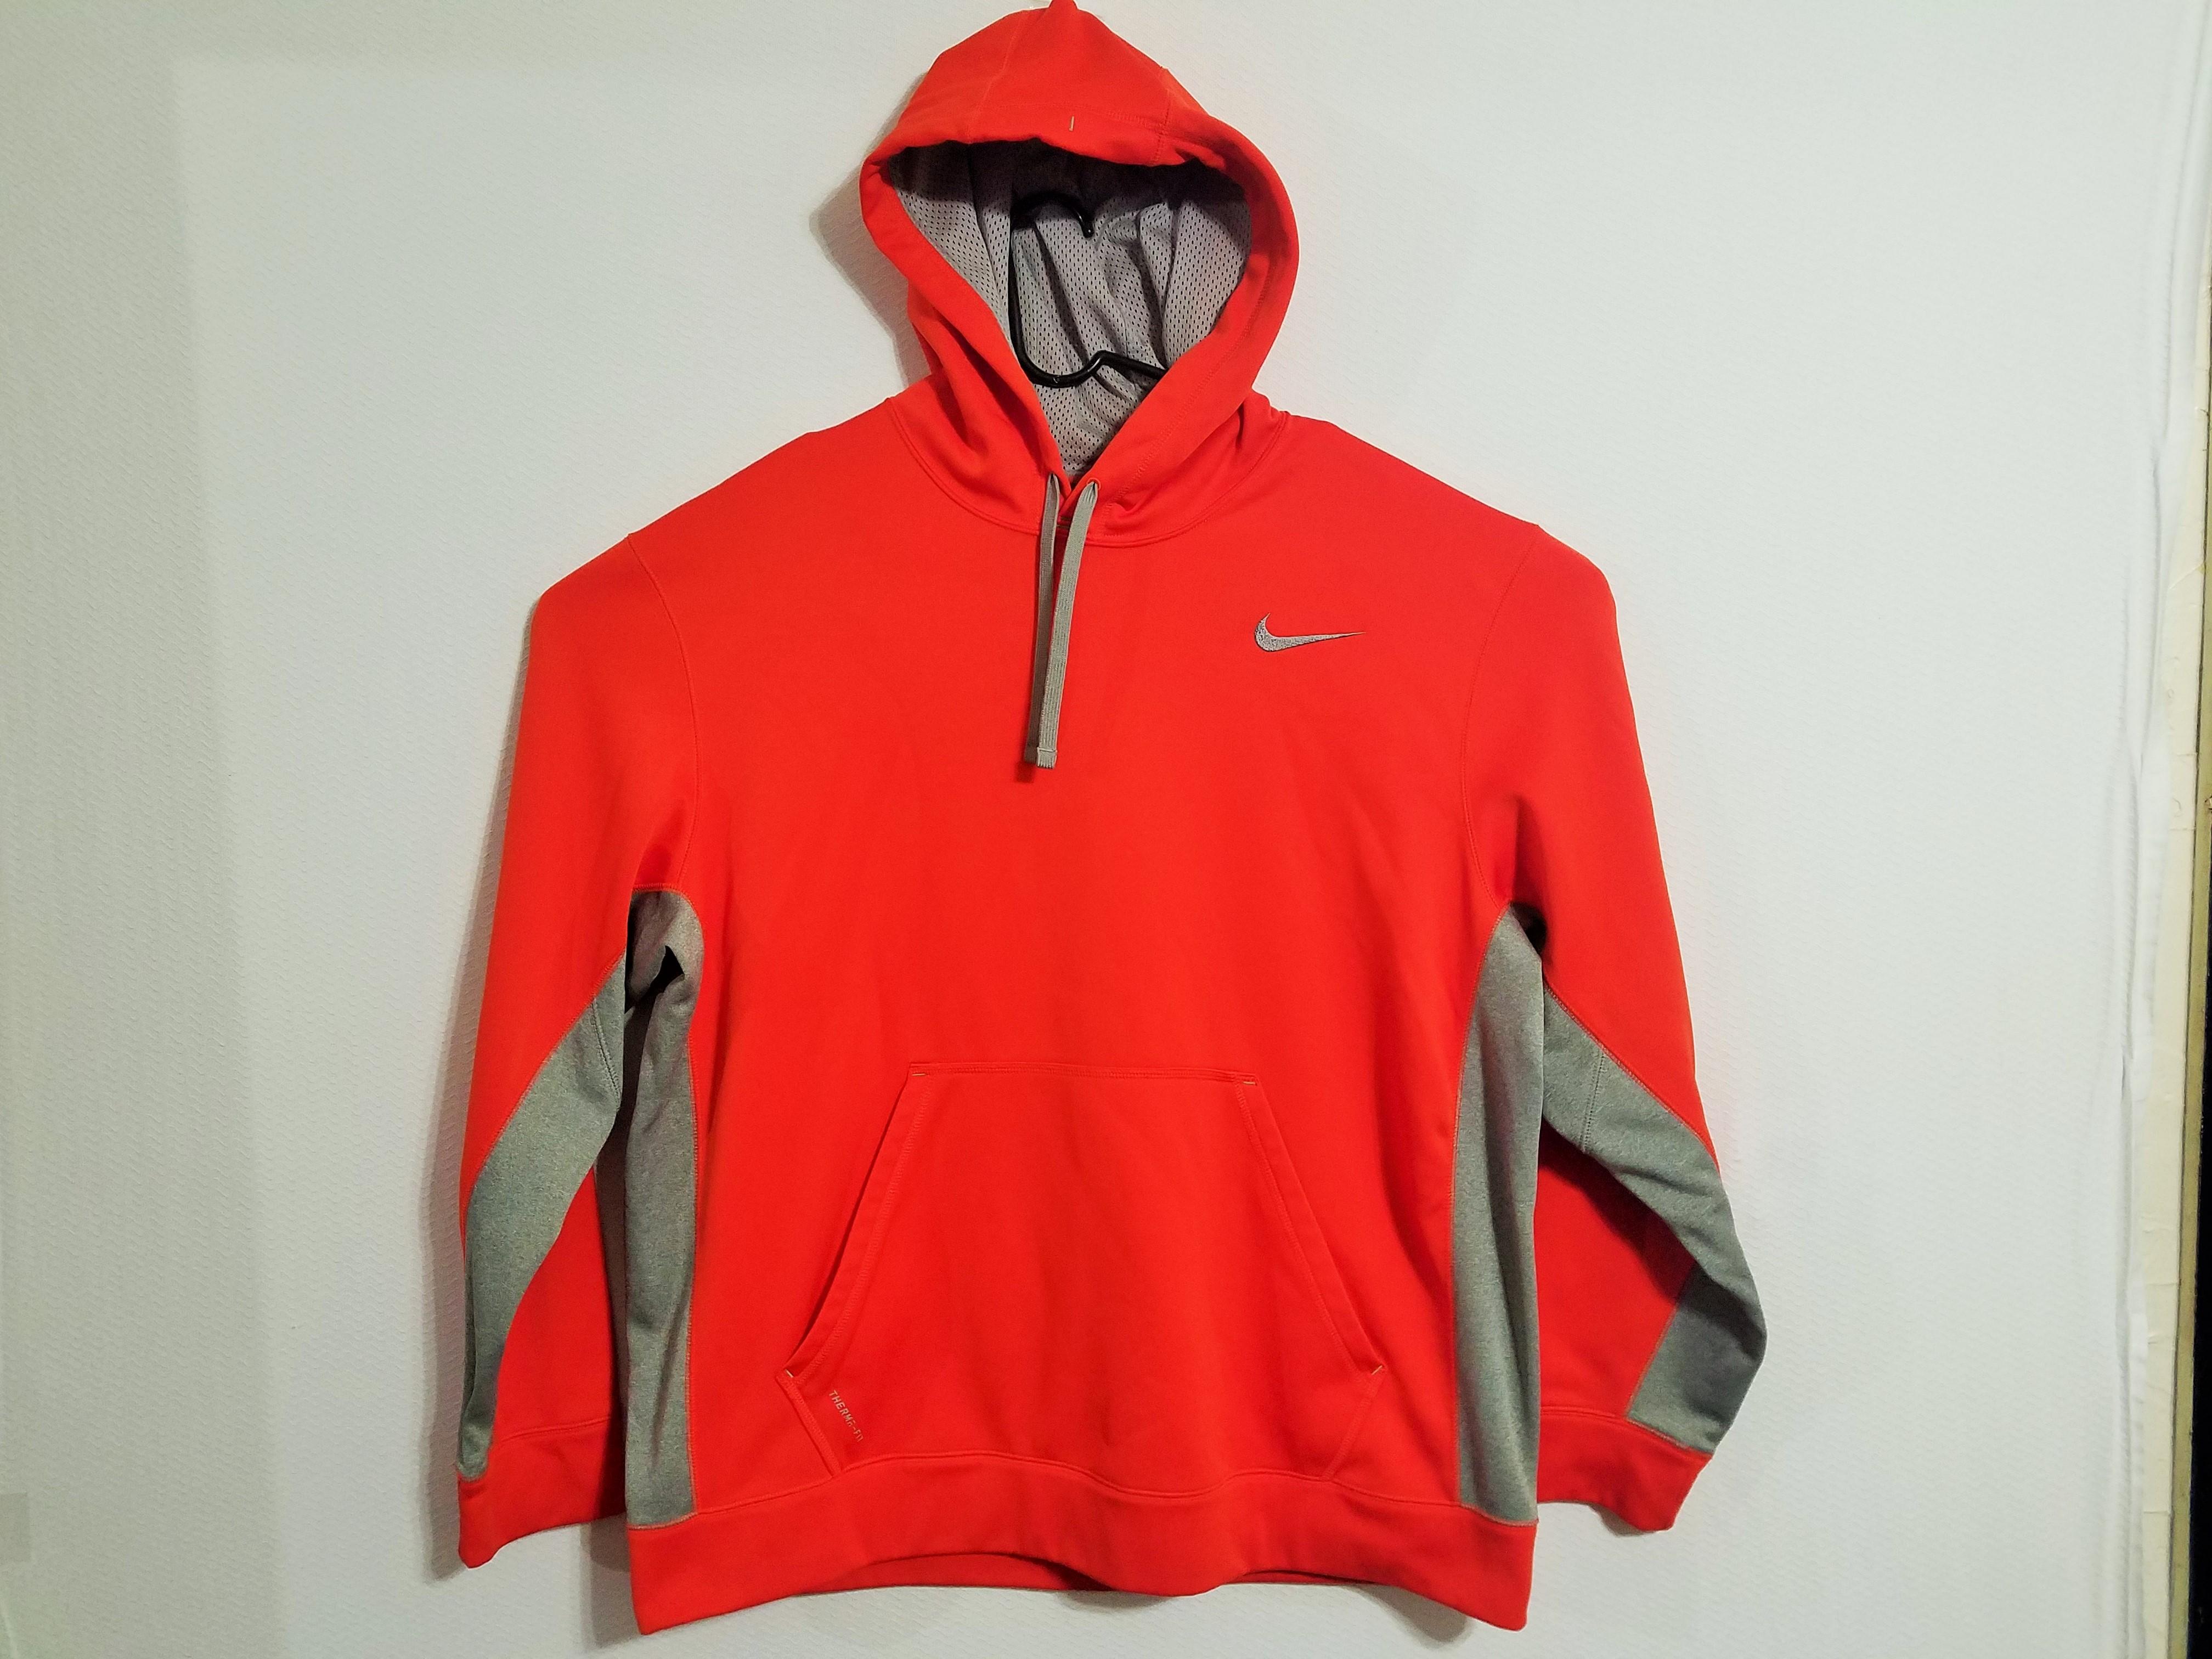 Nike Men's XXL Therma Fit Bright Orange & Grey Hoodie 2XL Hooded Sweatshirt 2X Thermafit